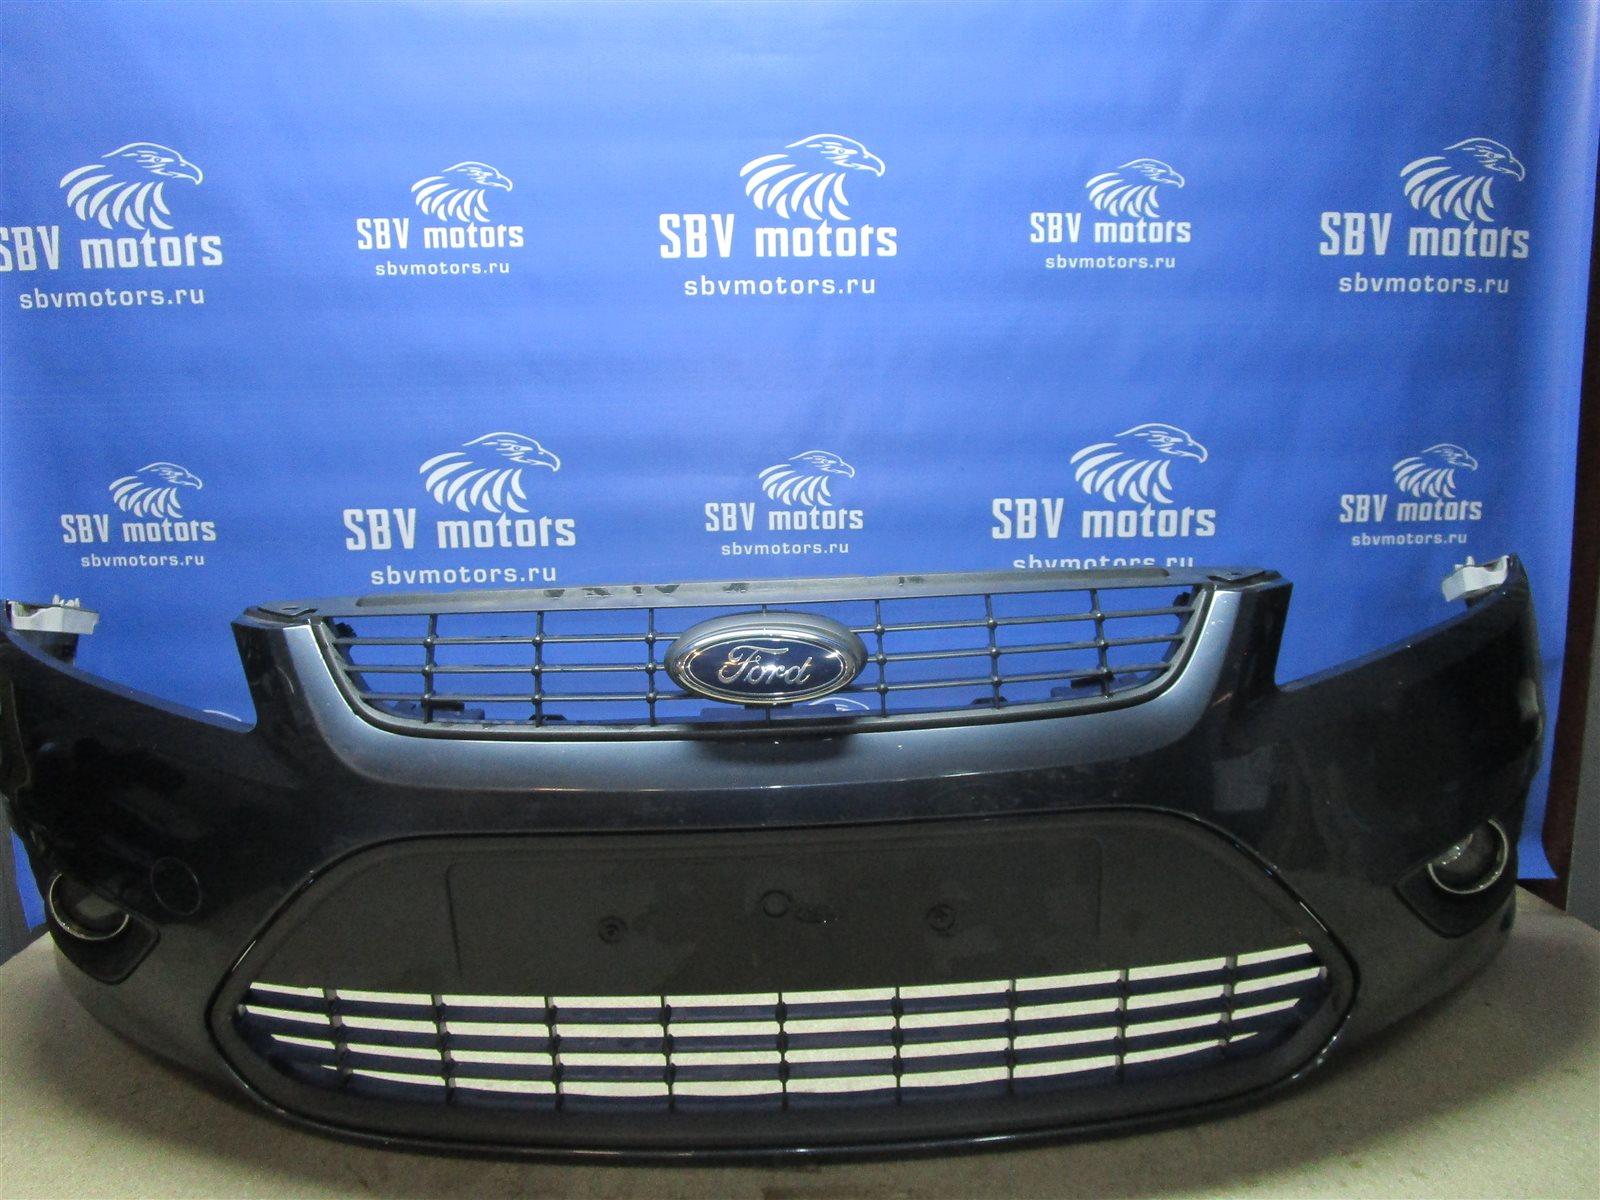 Бампер Ford Focus HATCH SHDA 1.6 DURATEС 100 ЛС 2009г. передний